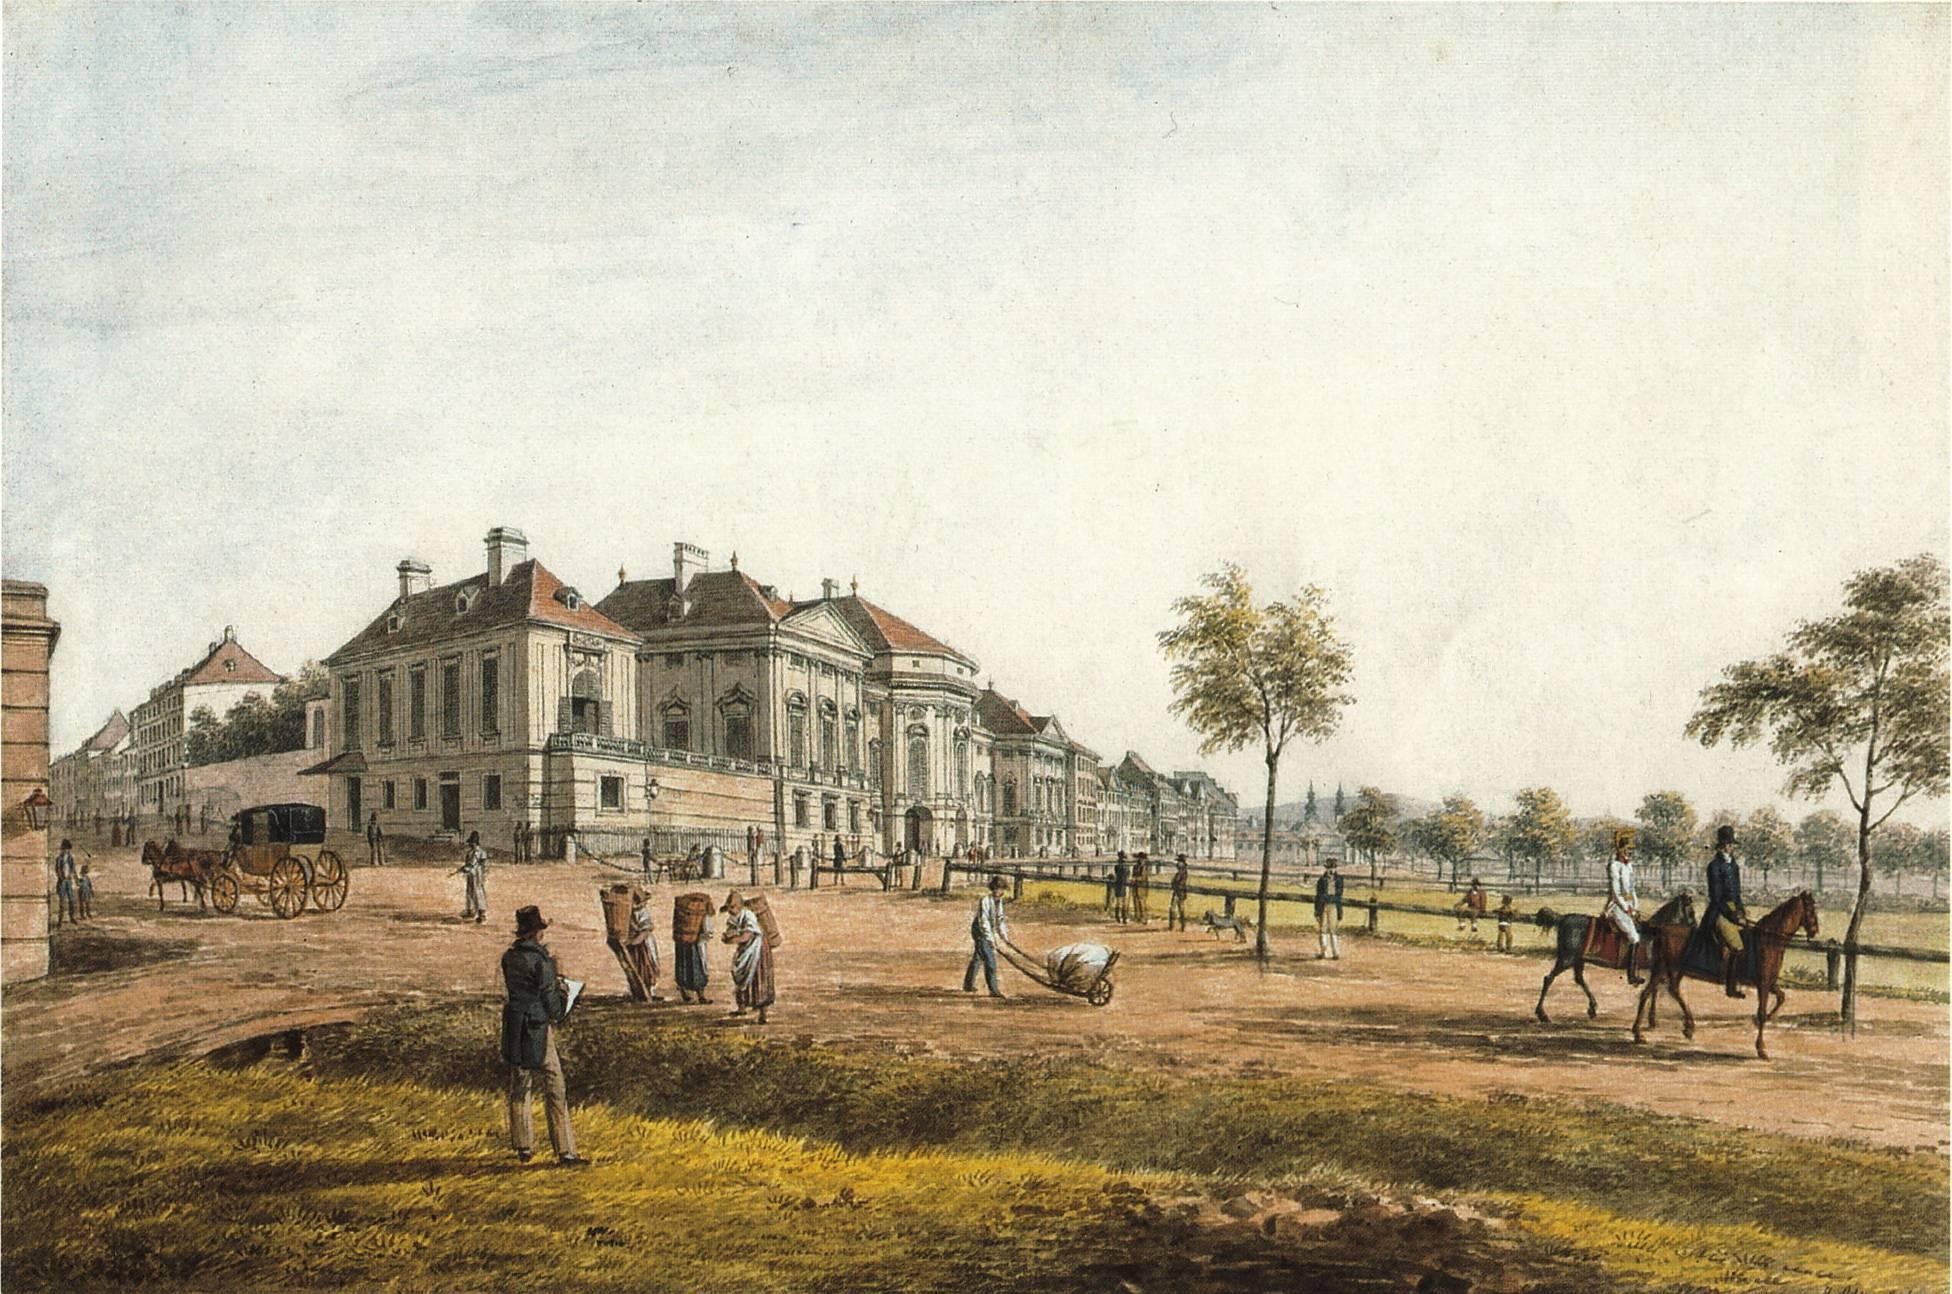 Josefstädter Glacis and Palais Auersperg, 1814